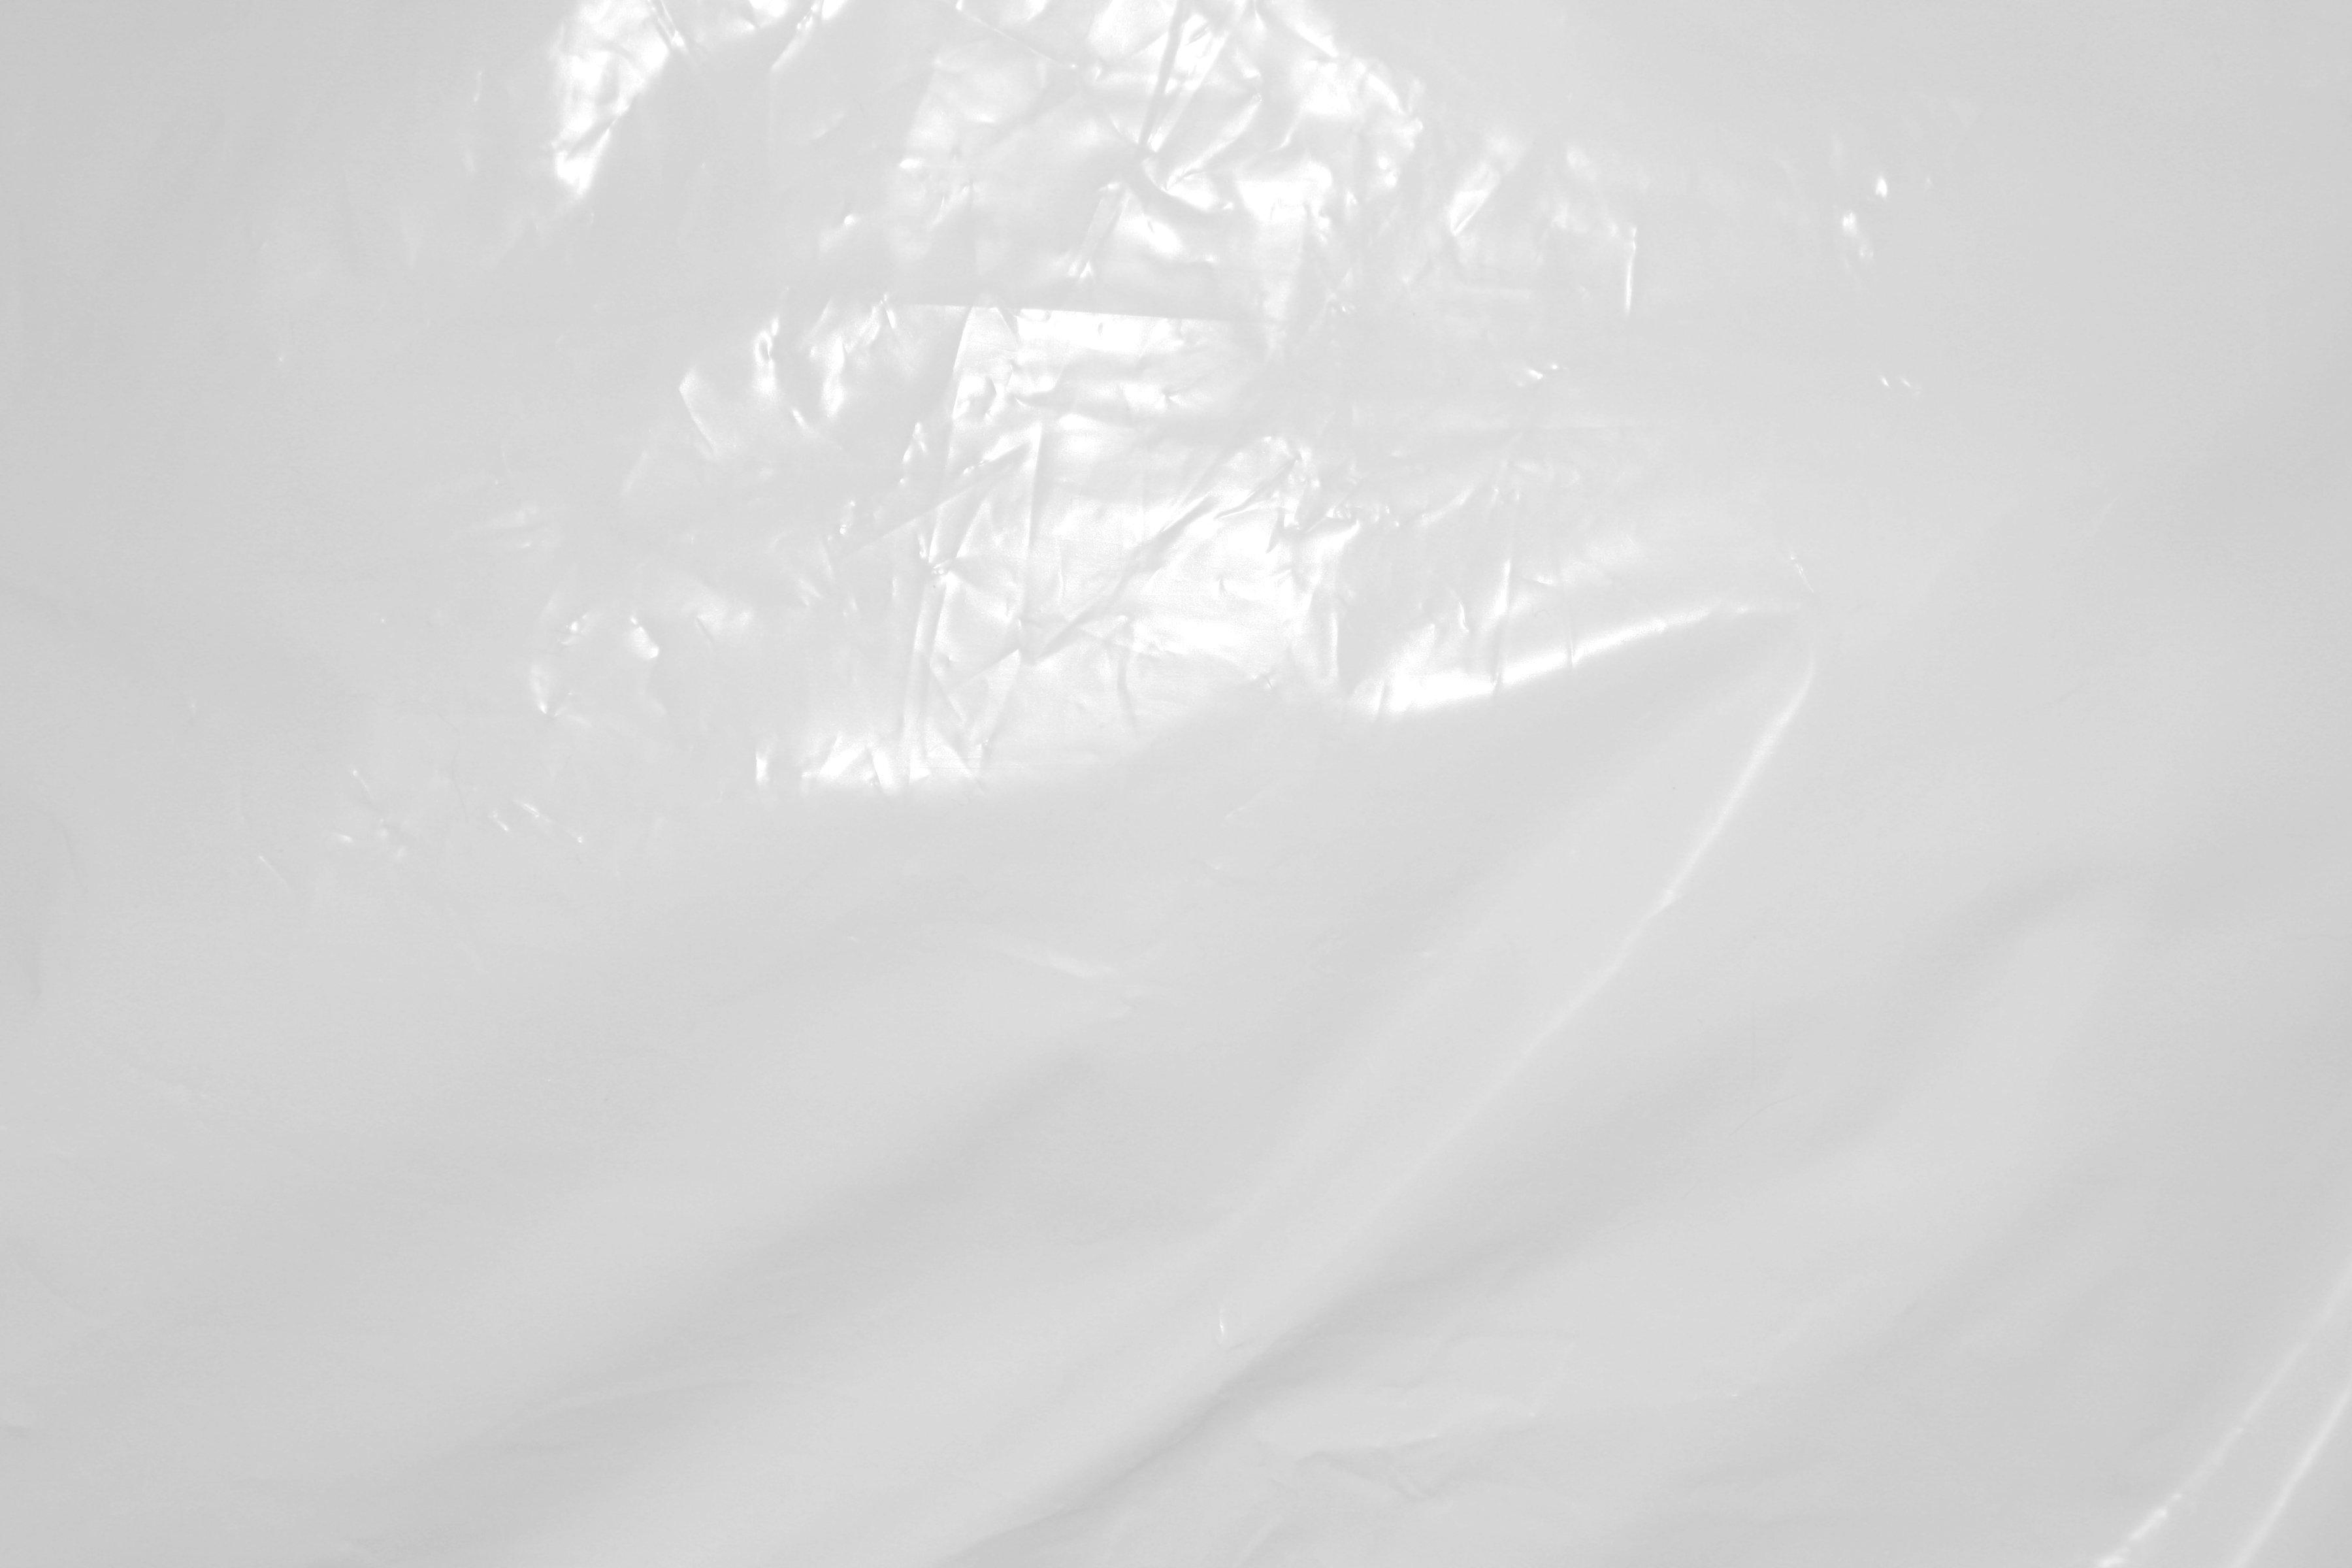 White Plastic Texture Picture Free